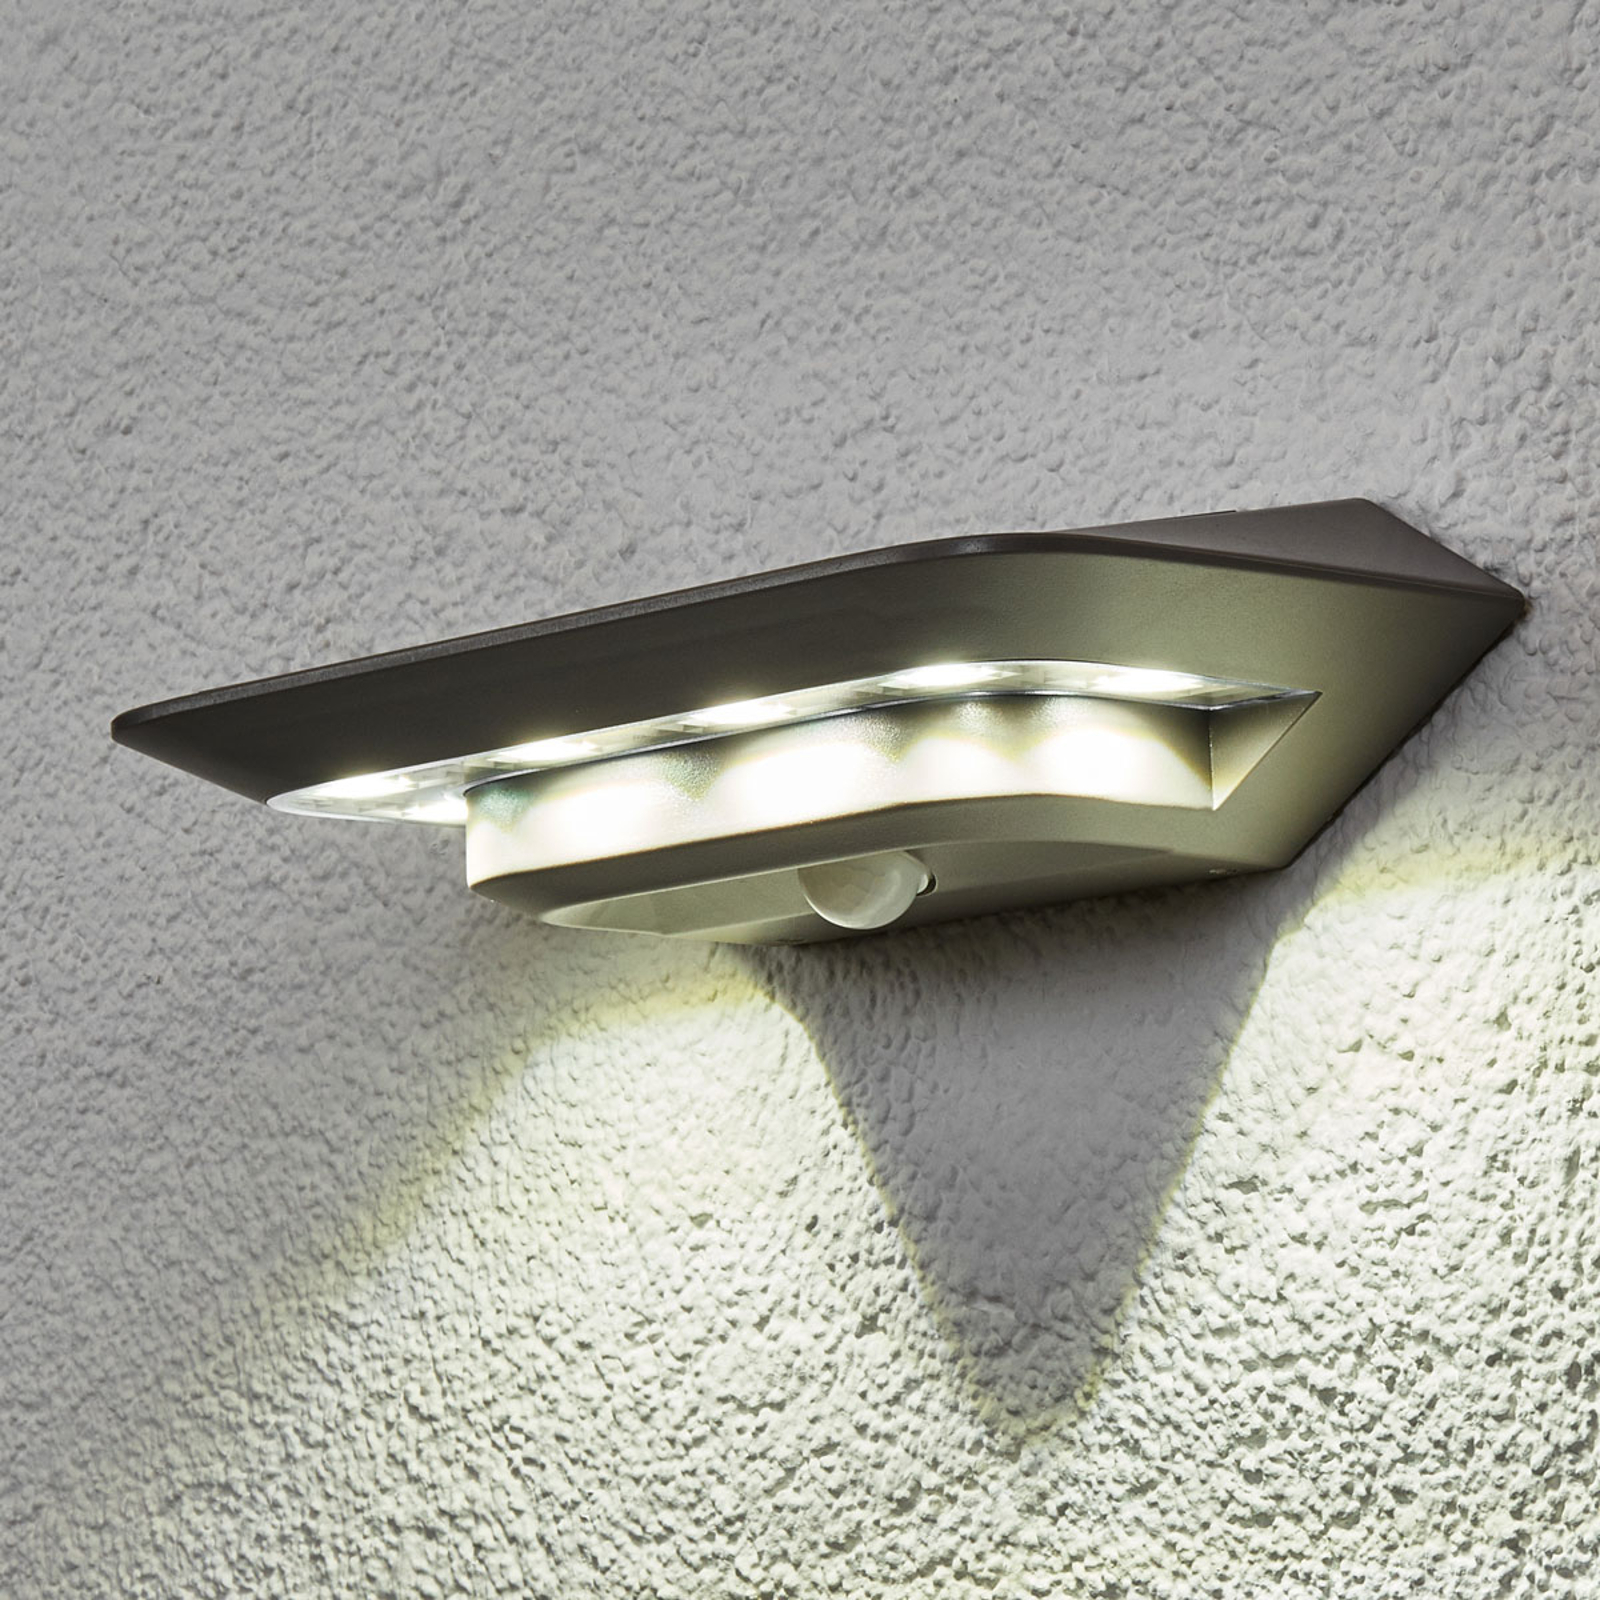 Solar-wandlamp GHOST met bewegingssensor